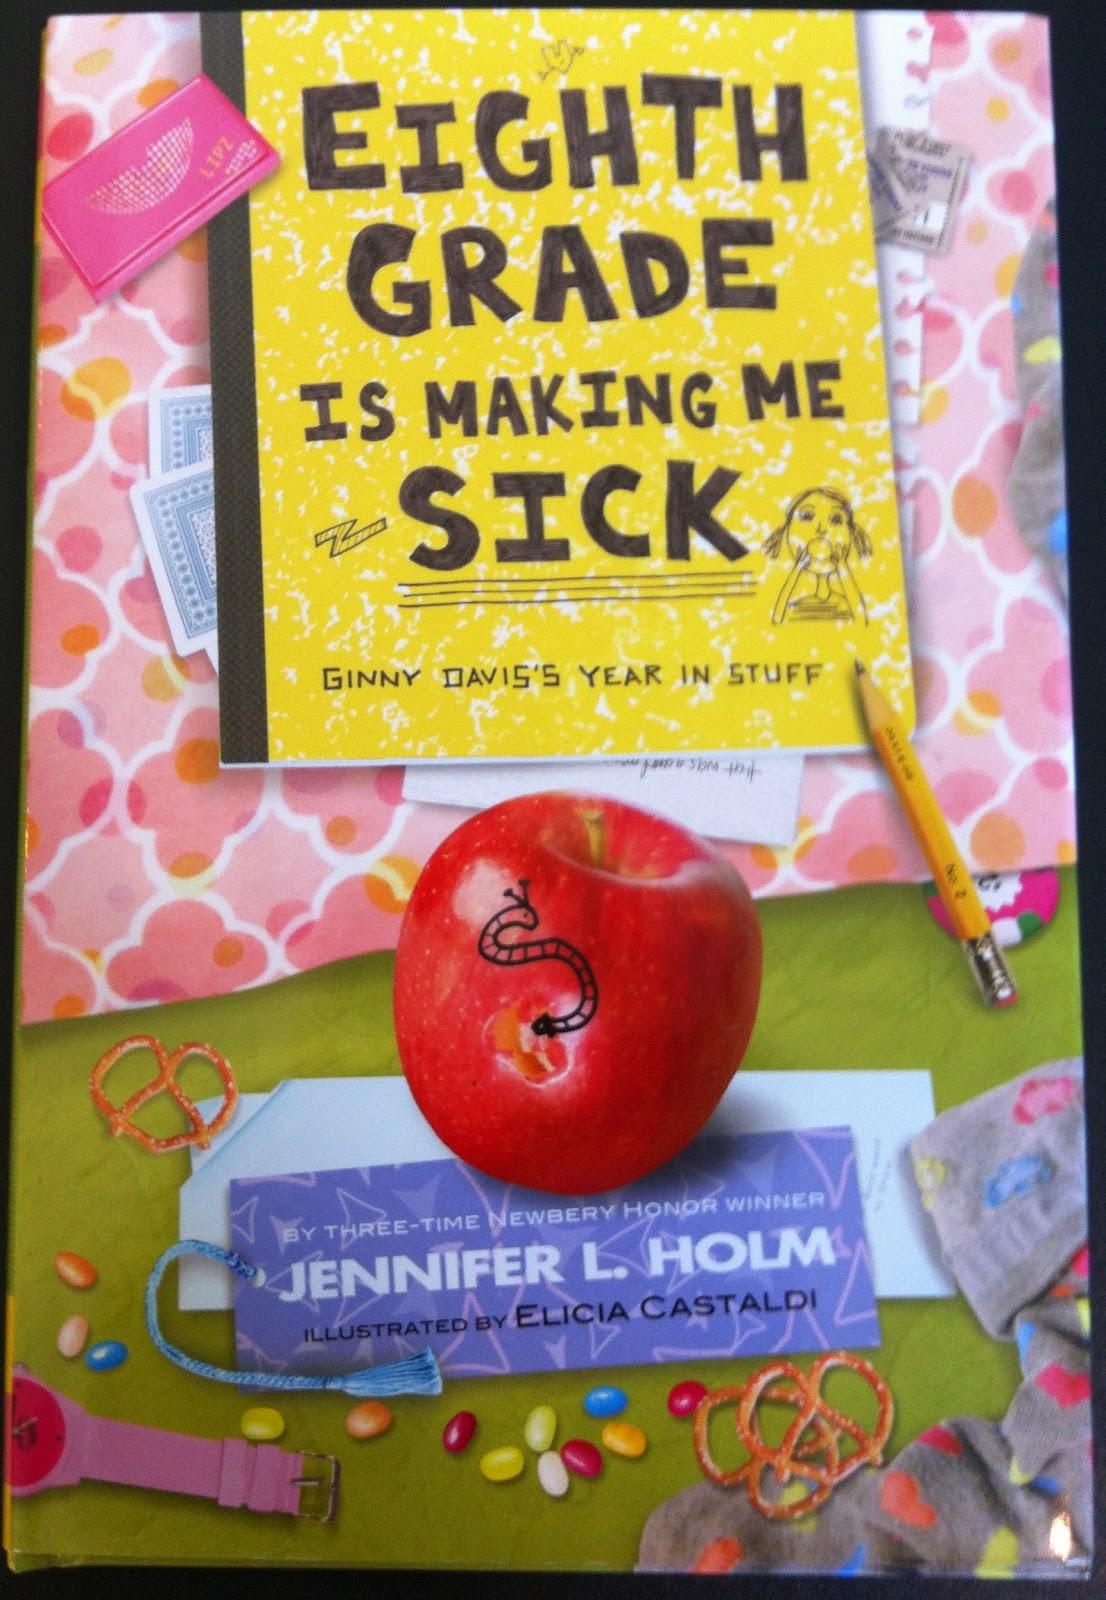 jenni-holm-eighth-grade-sick.jpg